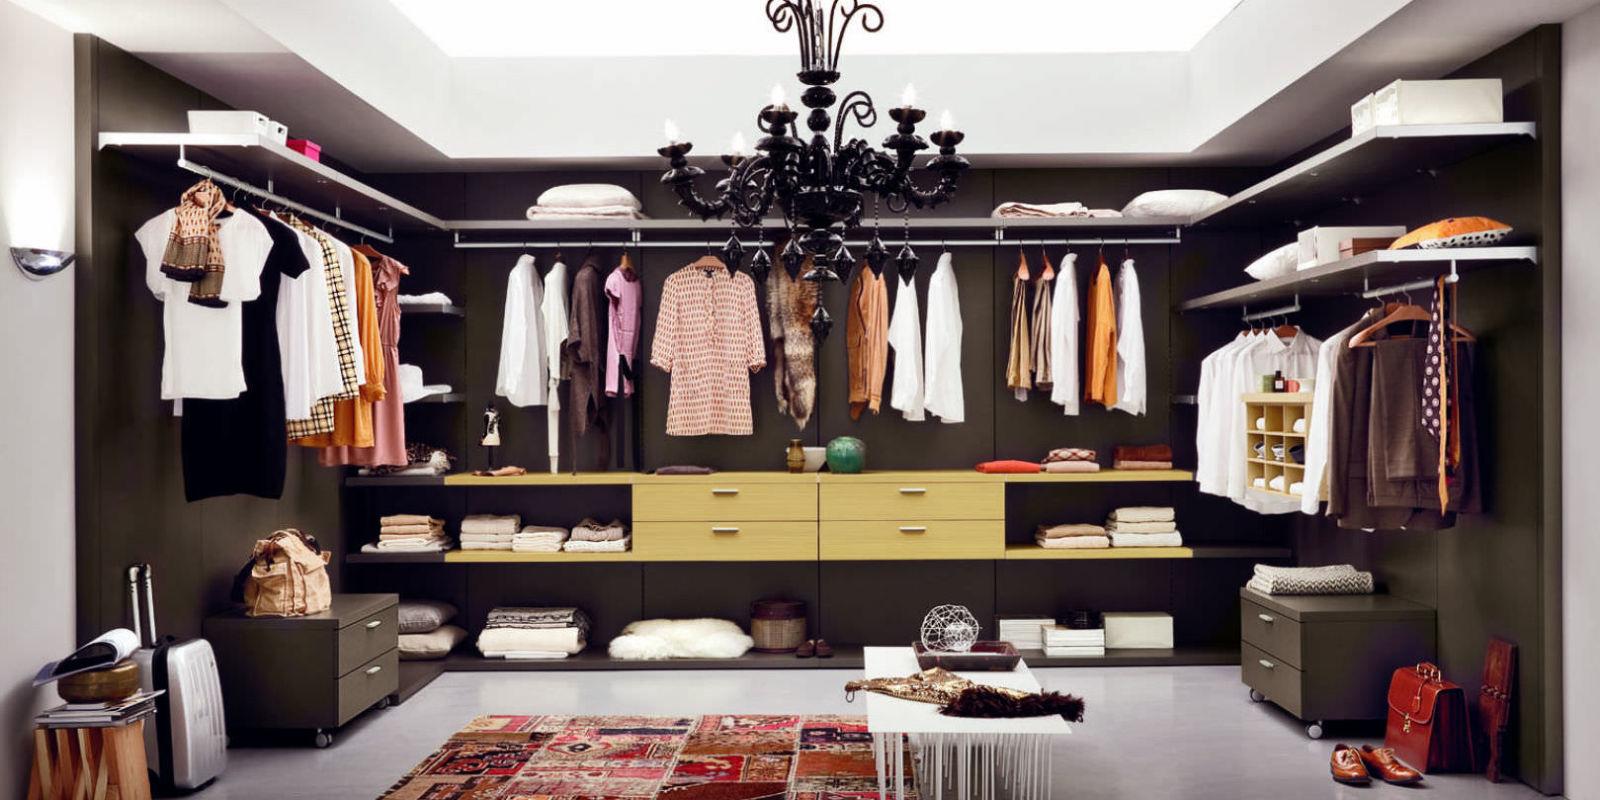 Stylish walk in wardrobe ideas keep your closet clutter free for Wardrobe interior designs for girls